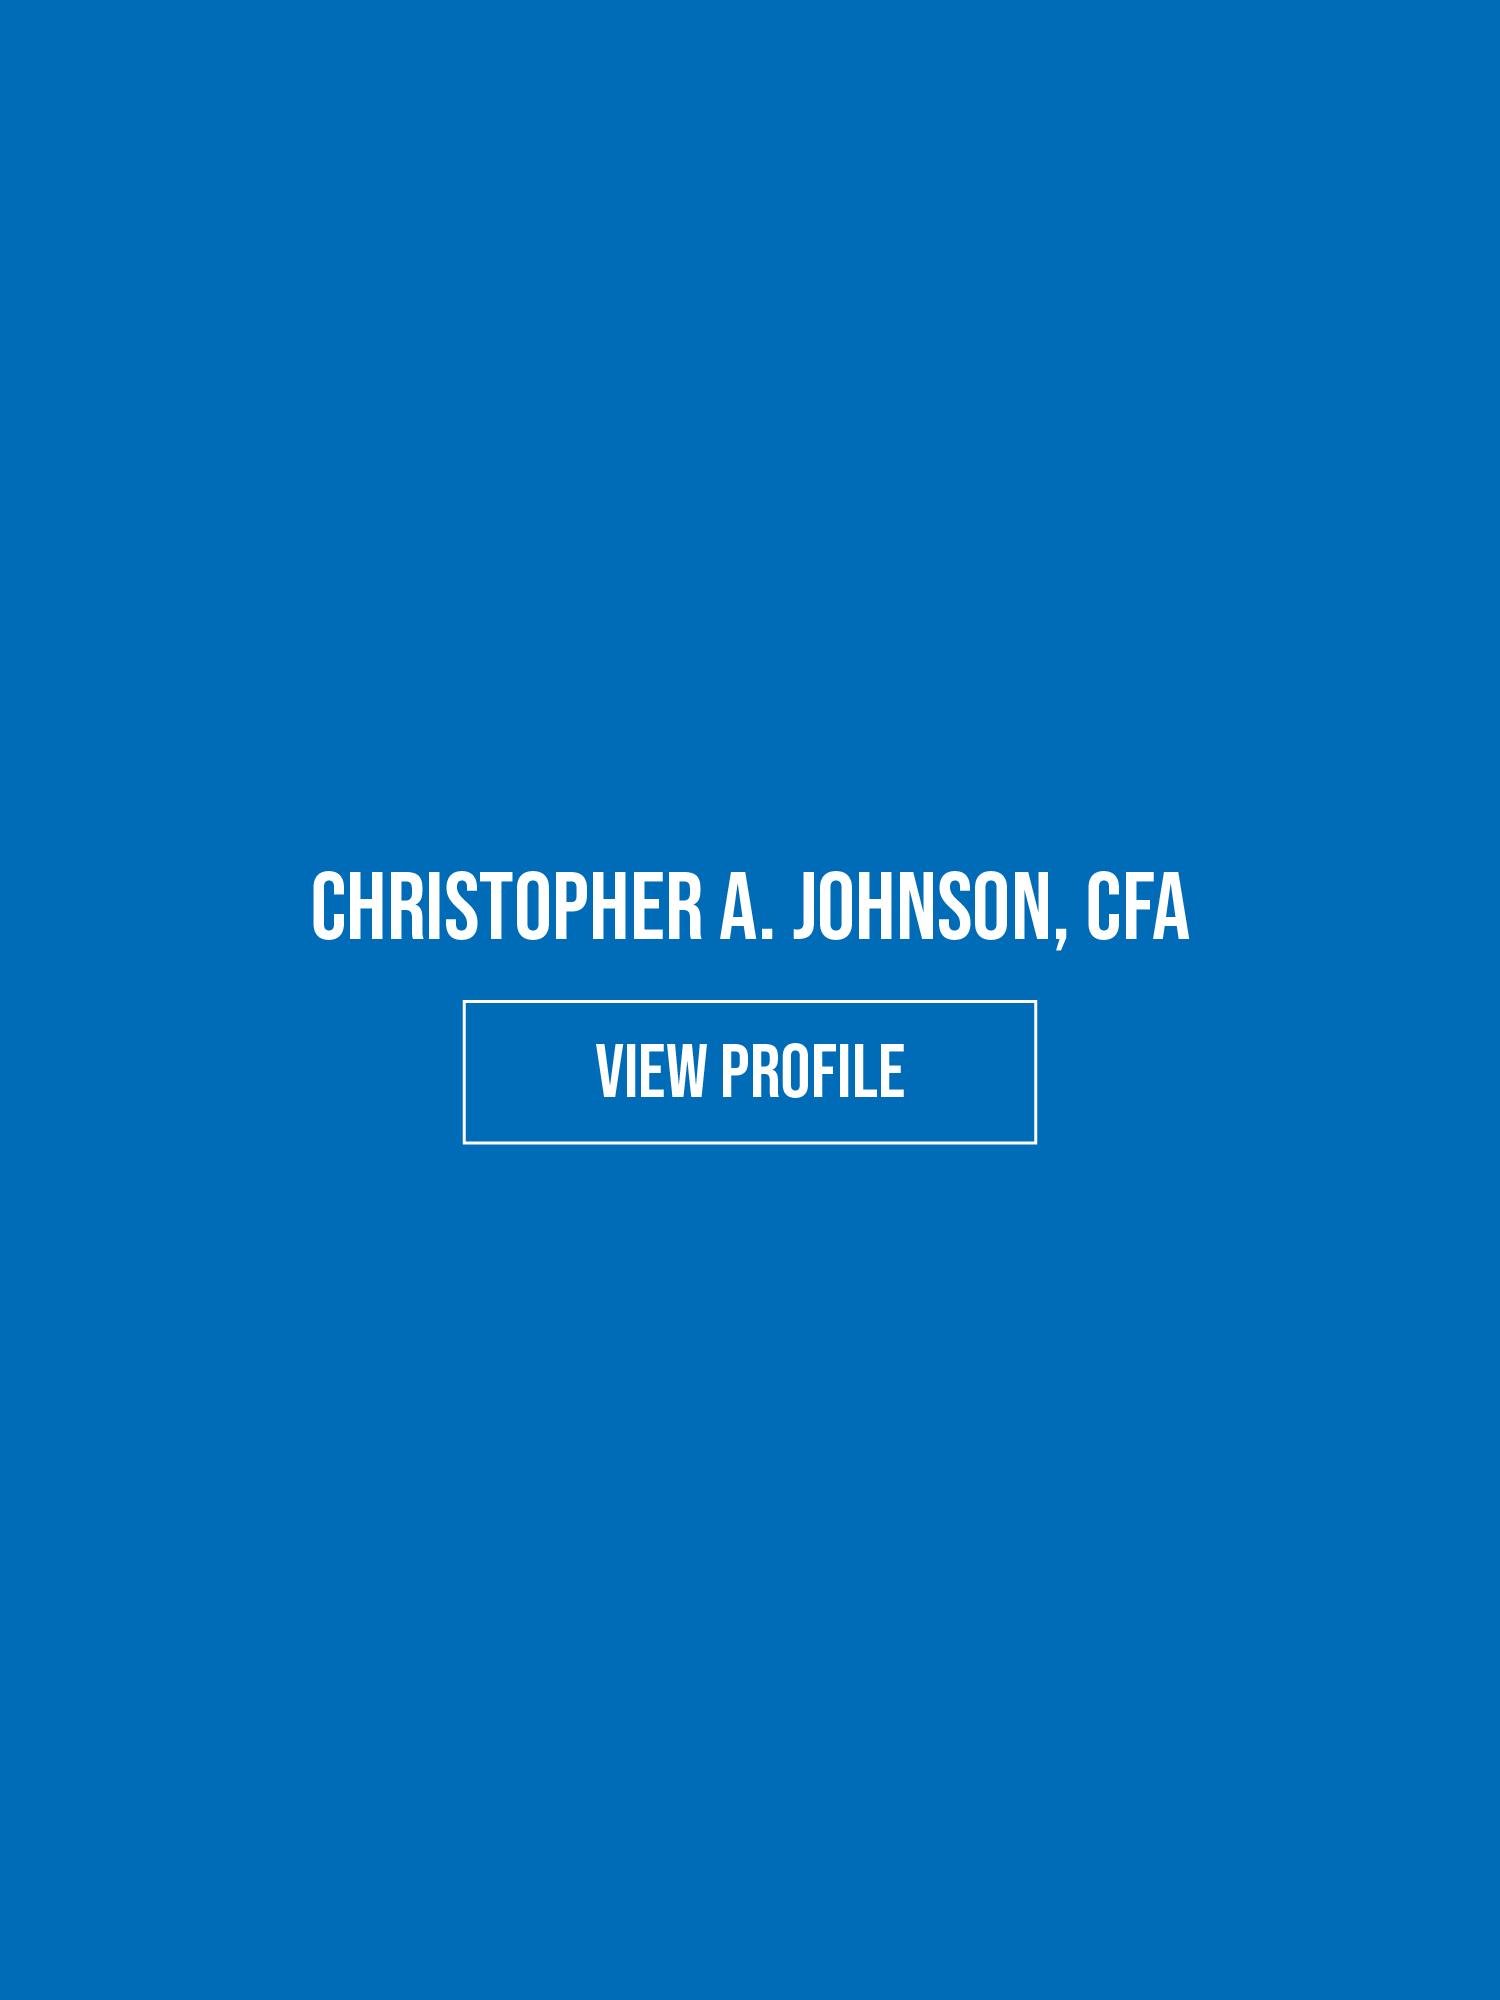 CHRISTOPHER A. JOHNSON, CFA